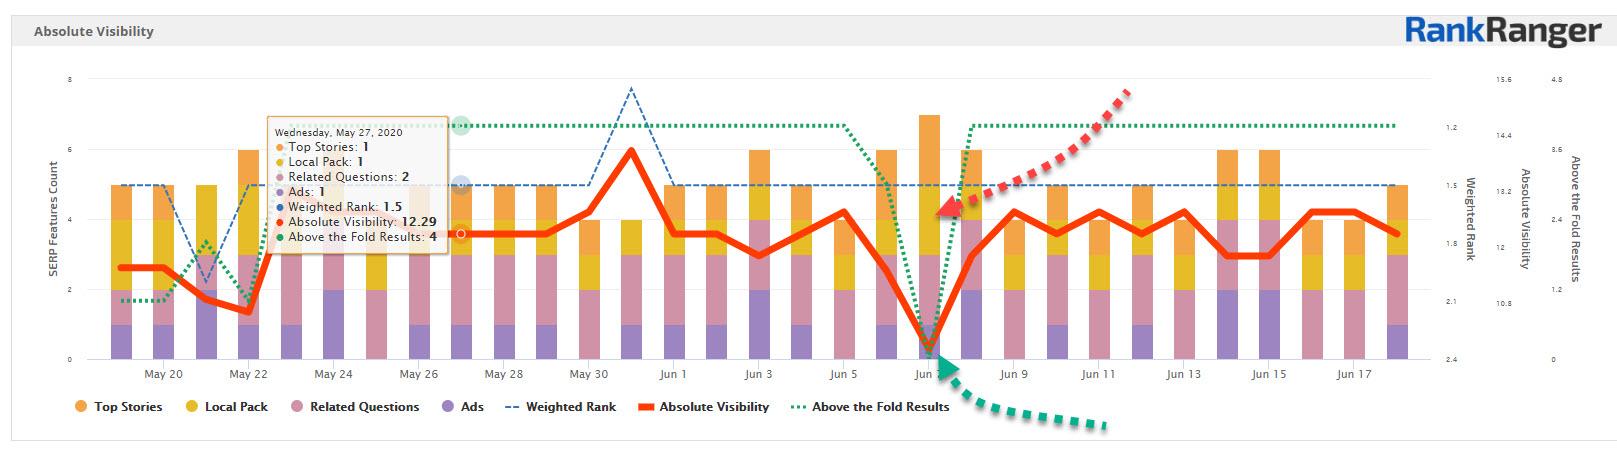 absolute visibility graph rank ranger